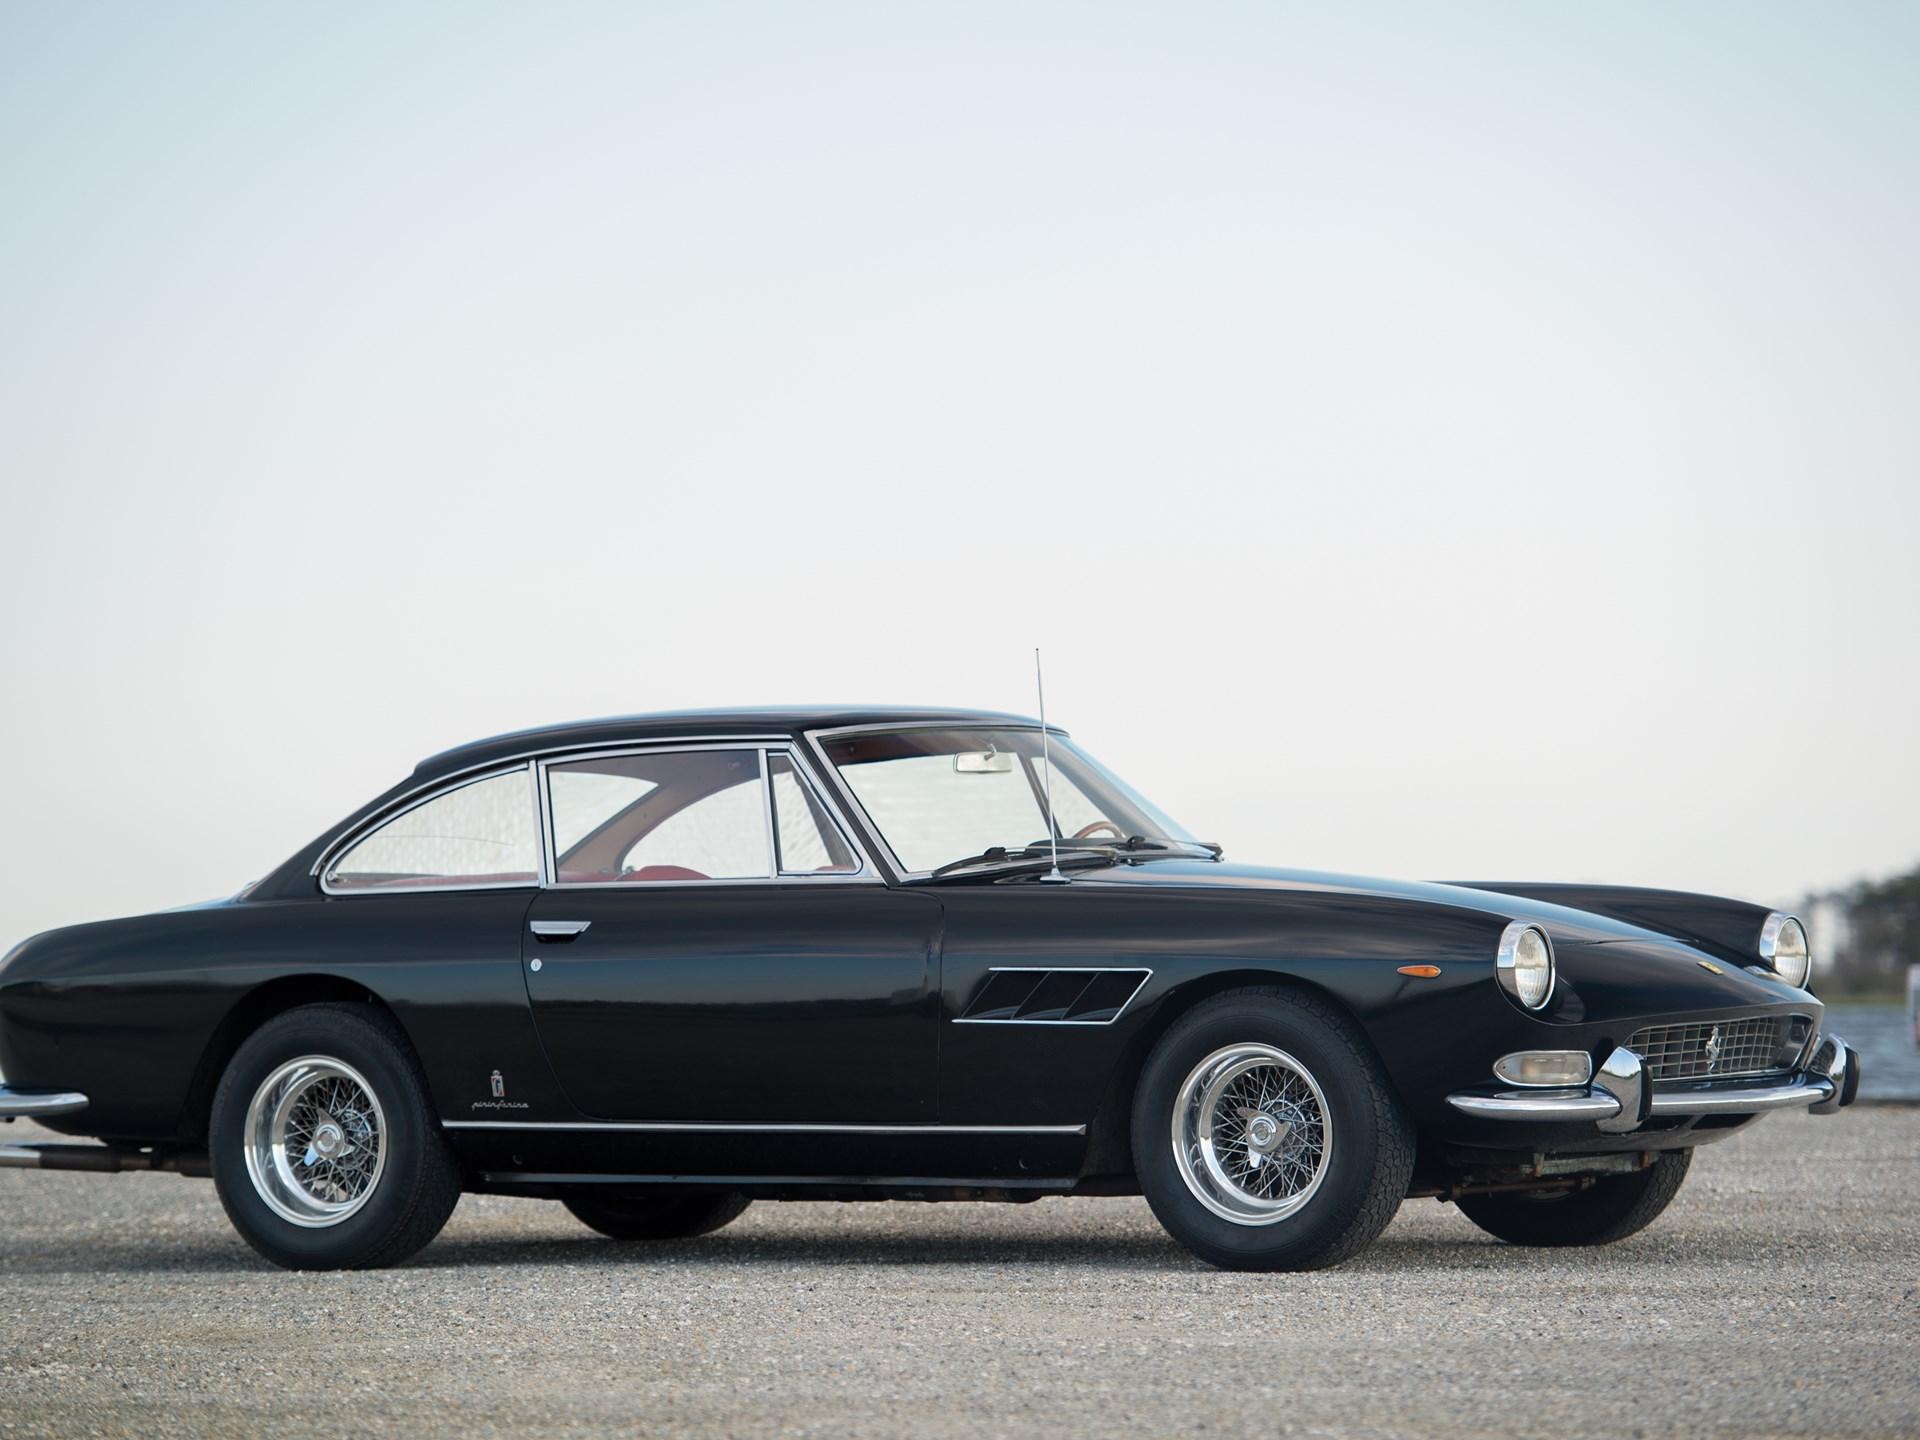 1966 Ferrari 330 Series II GT 2+2